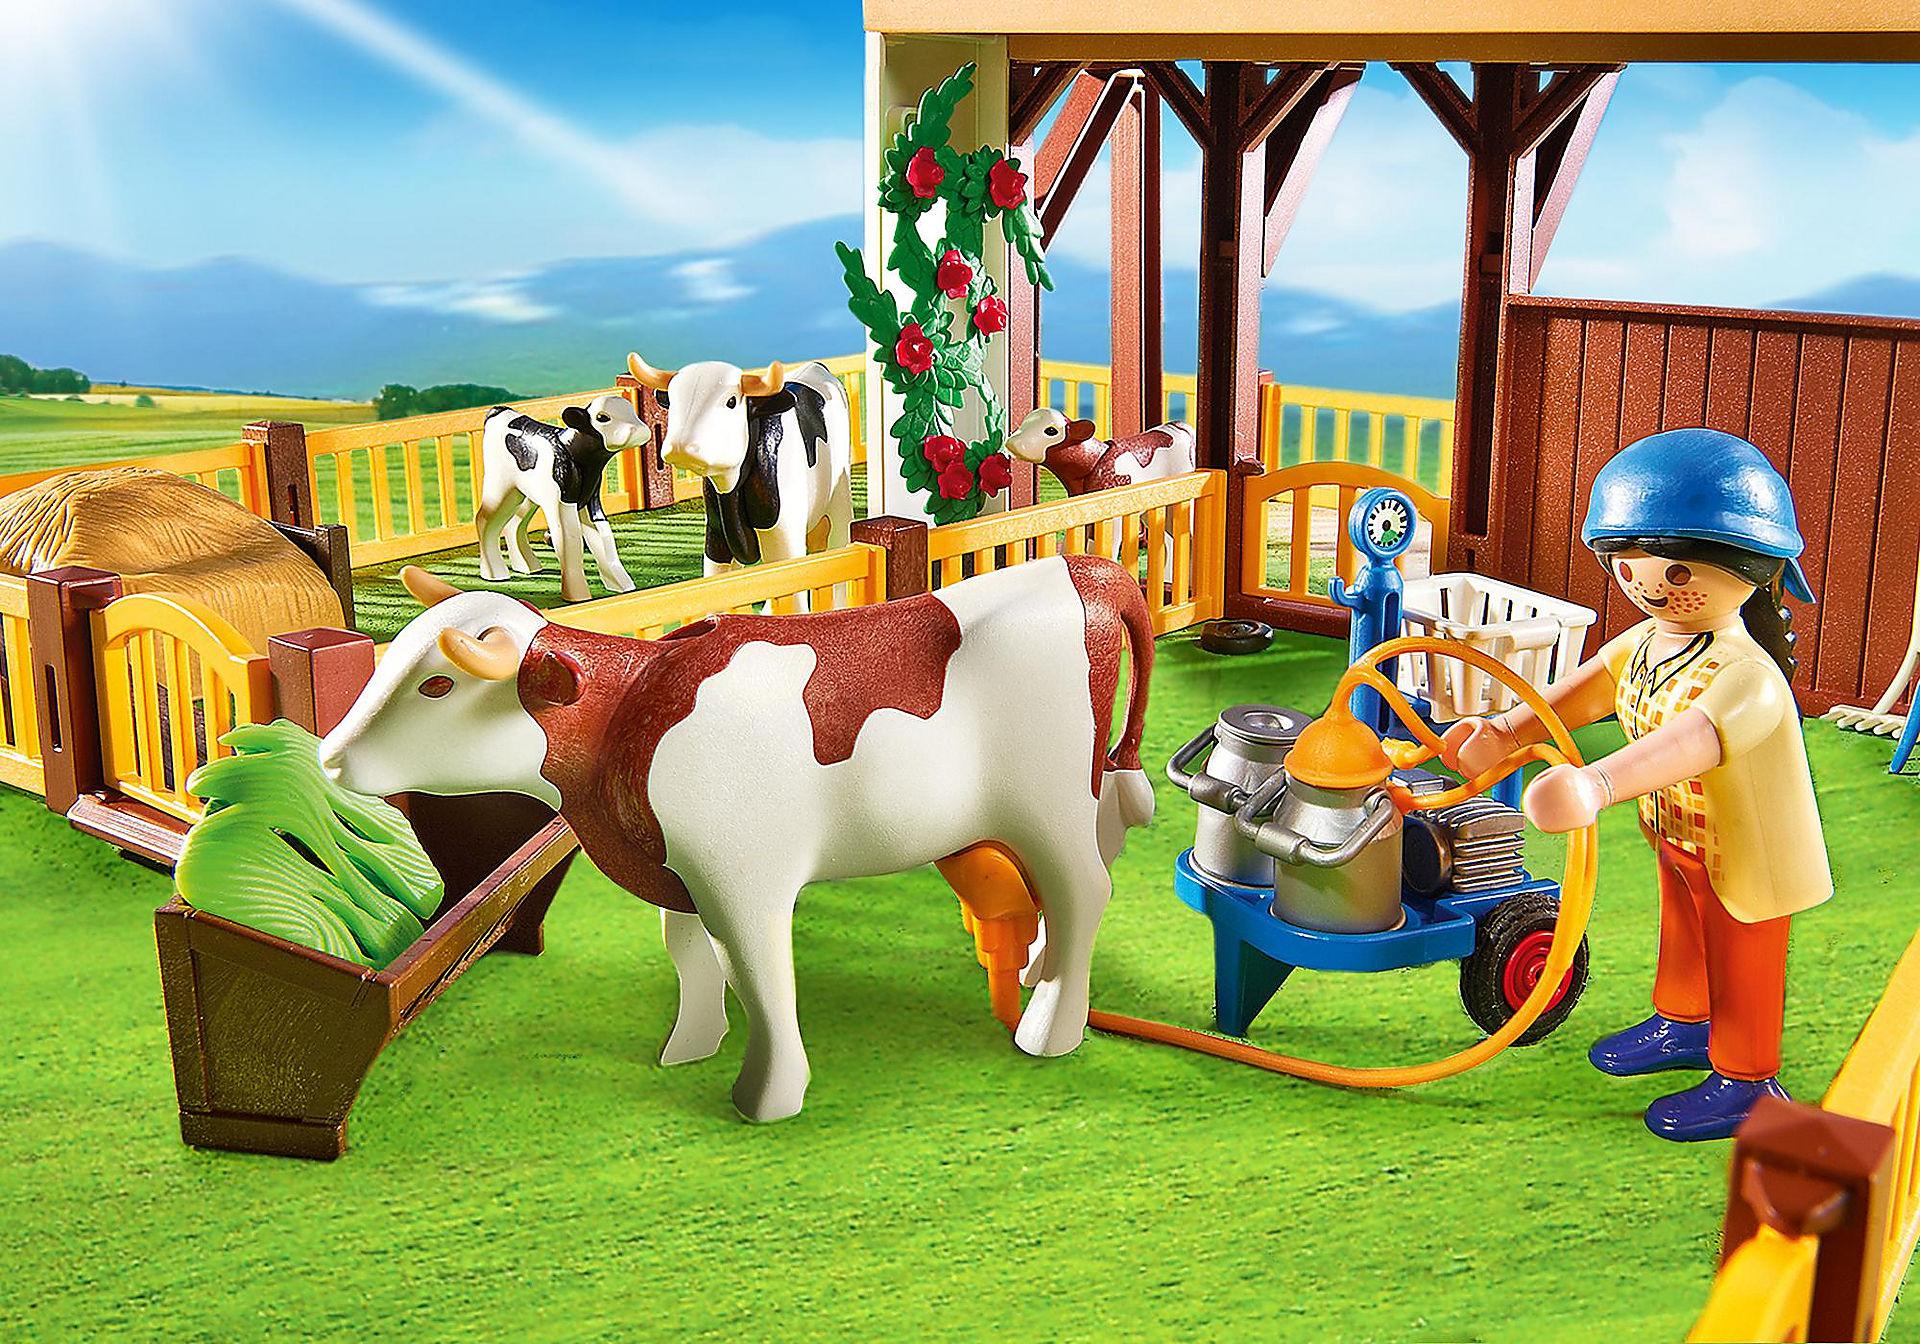 http://media.playmobil.com/i/playmobil/6120_product_extra1/Grote boerderij